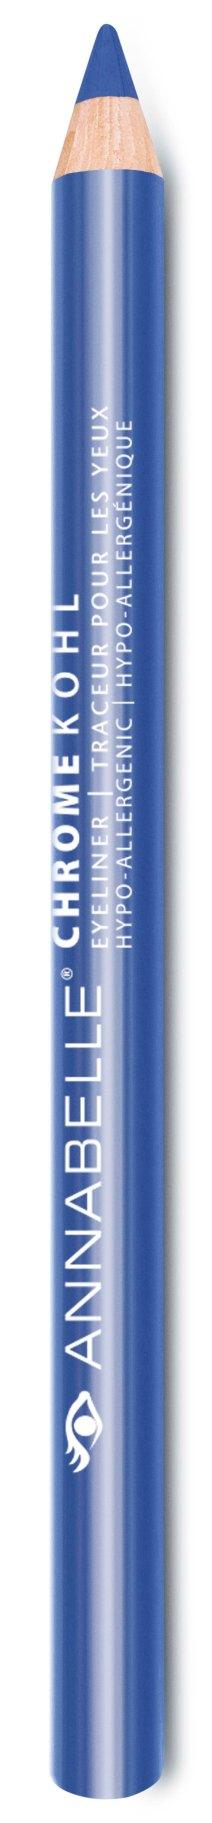 CHROME KOHL - Blue